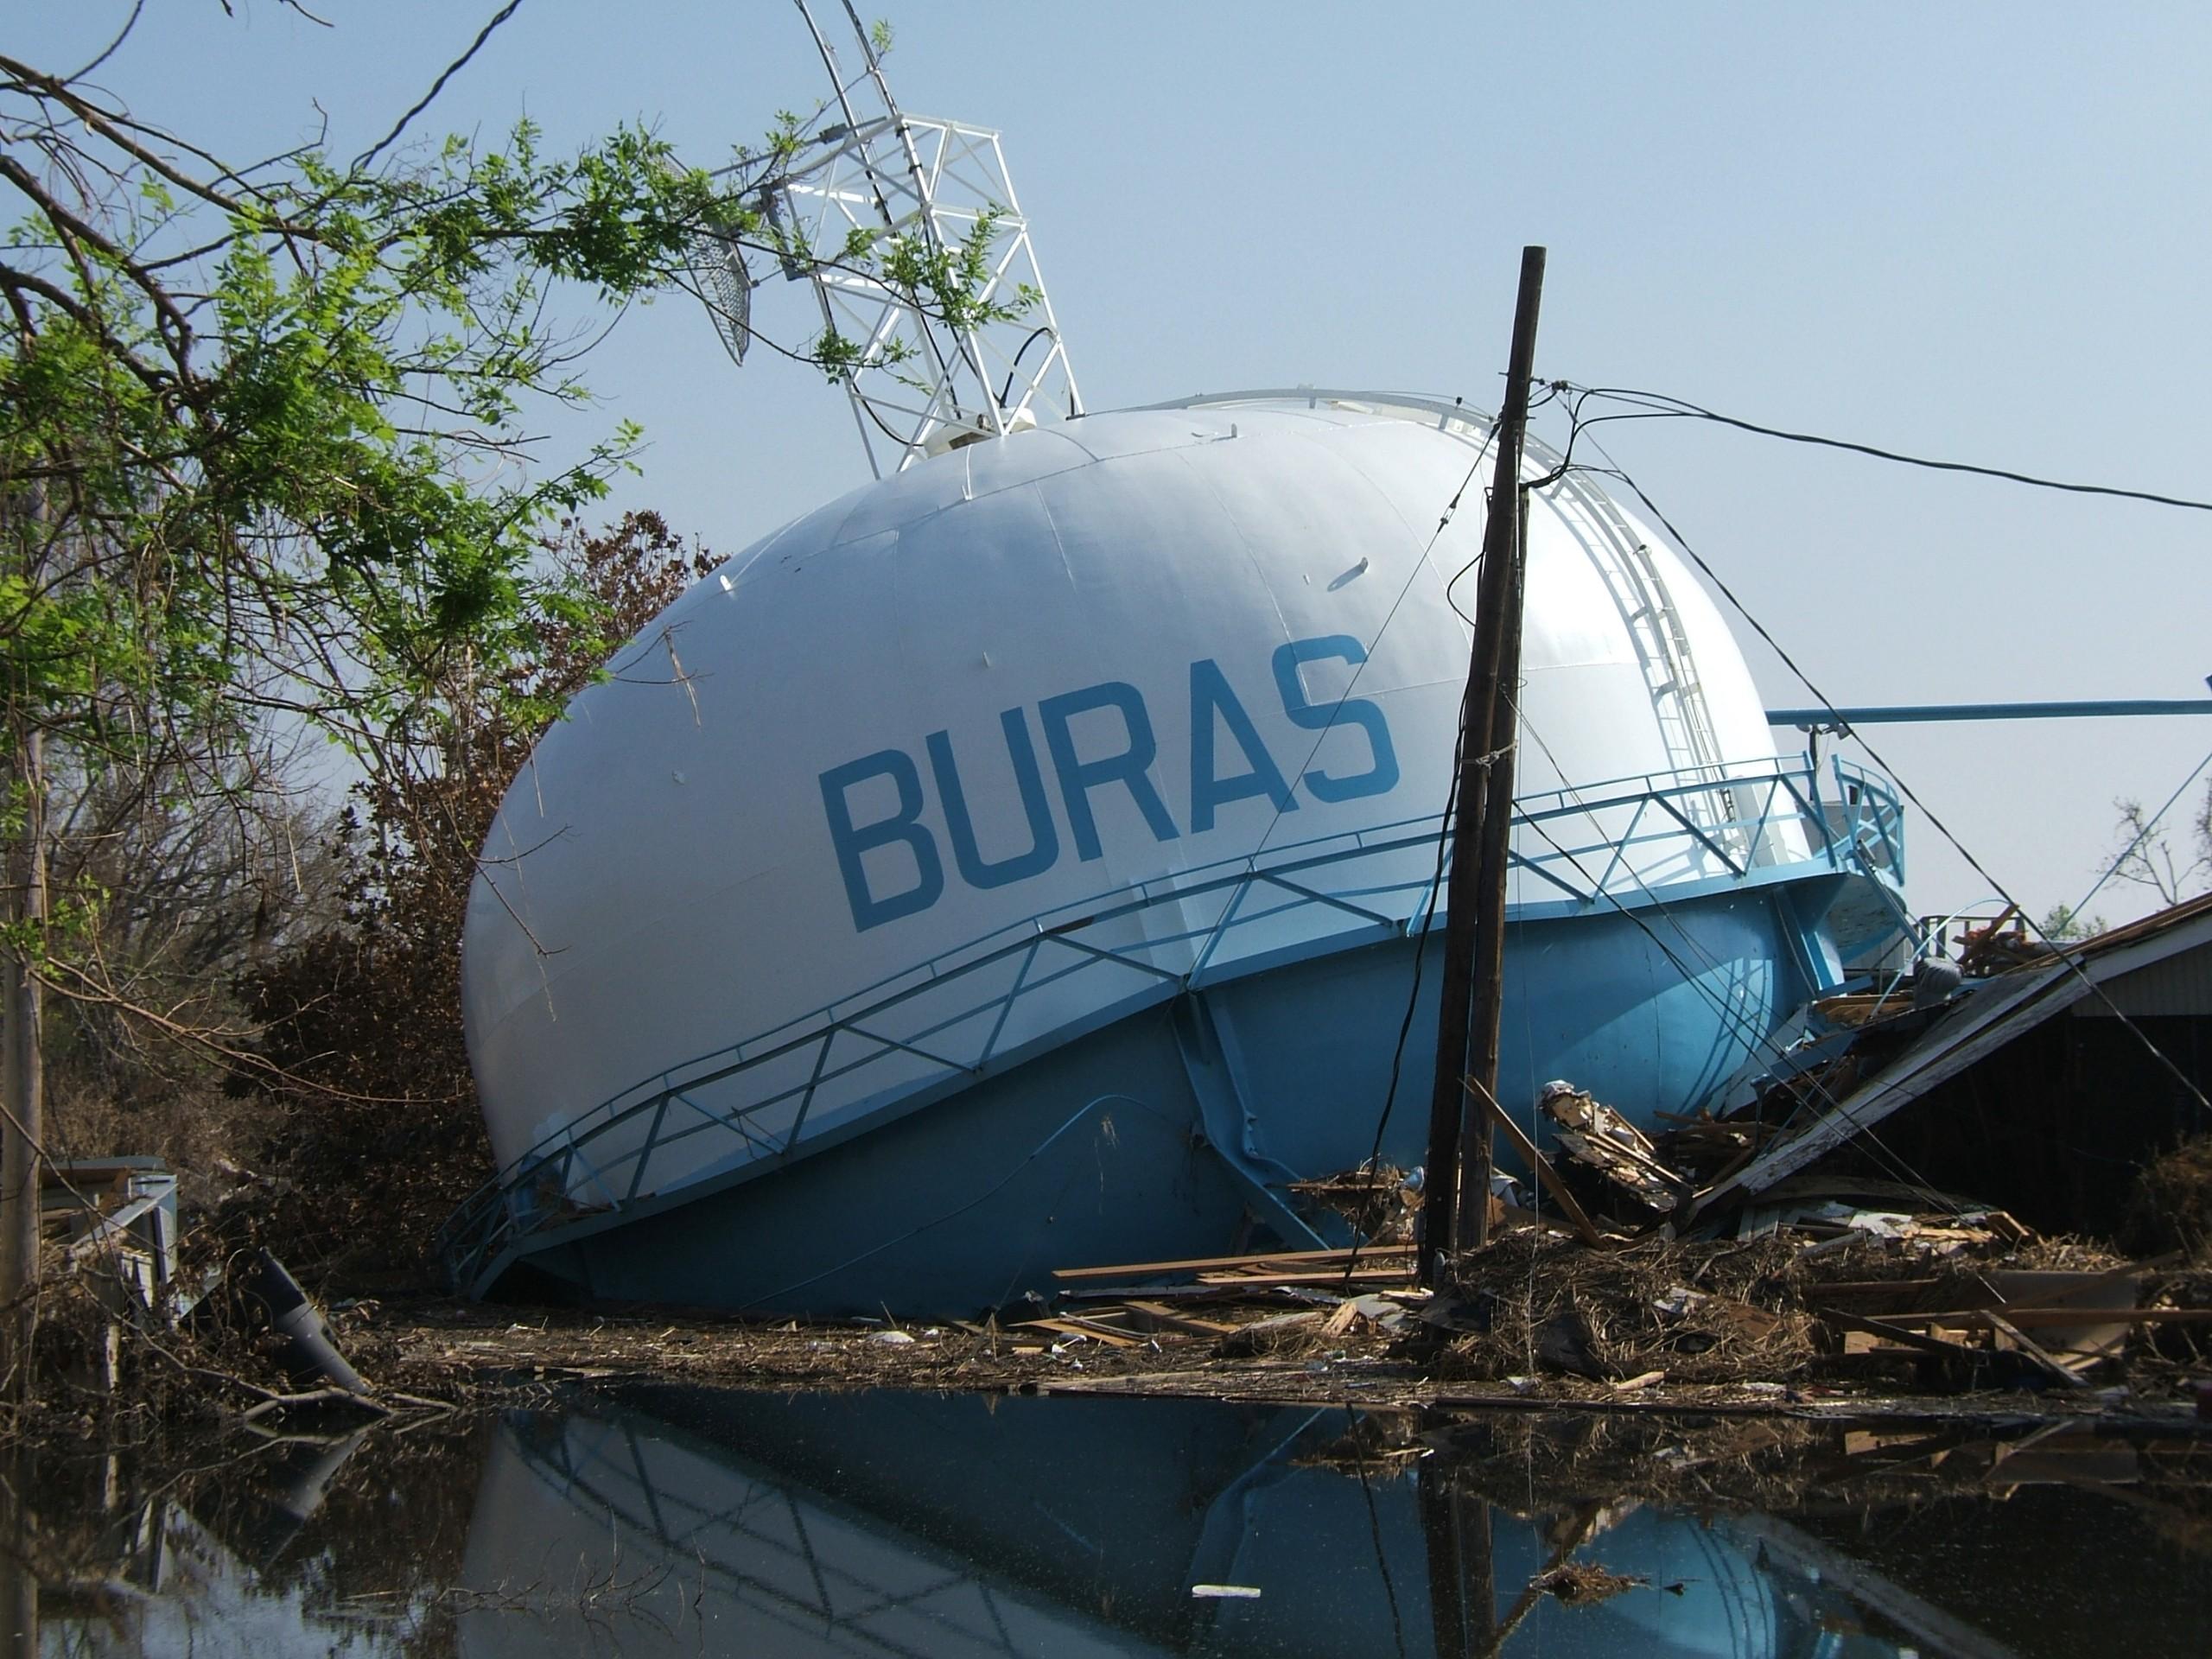 Buras, Louisiana after Hurricane Katrina. Photo by Ryan Lambert Hurricane